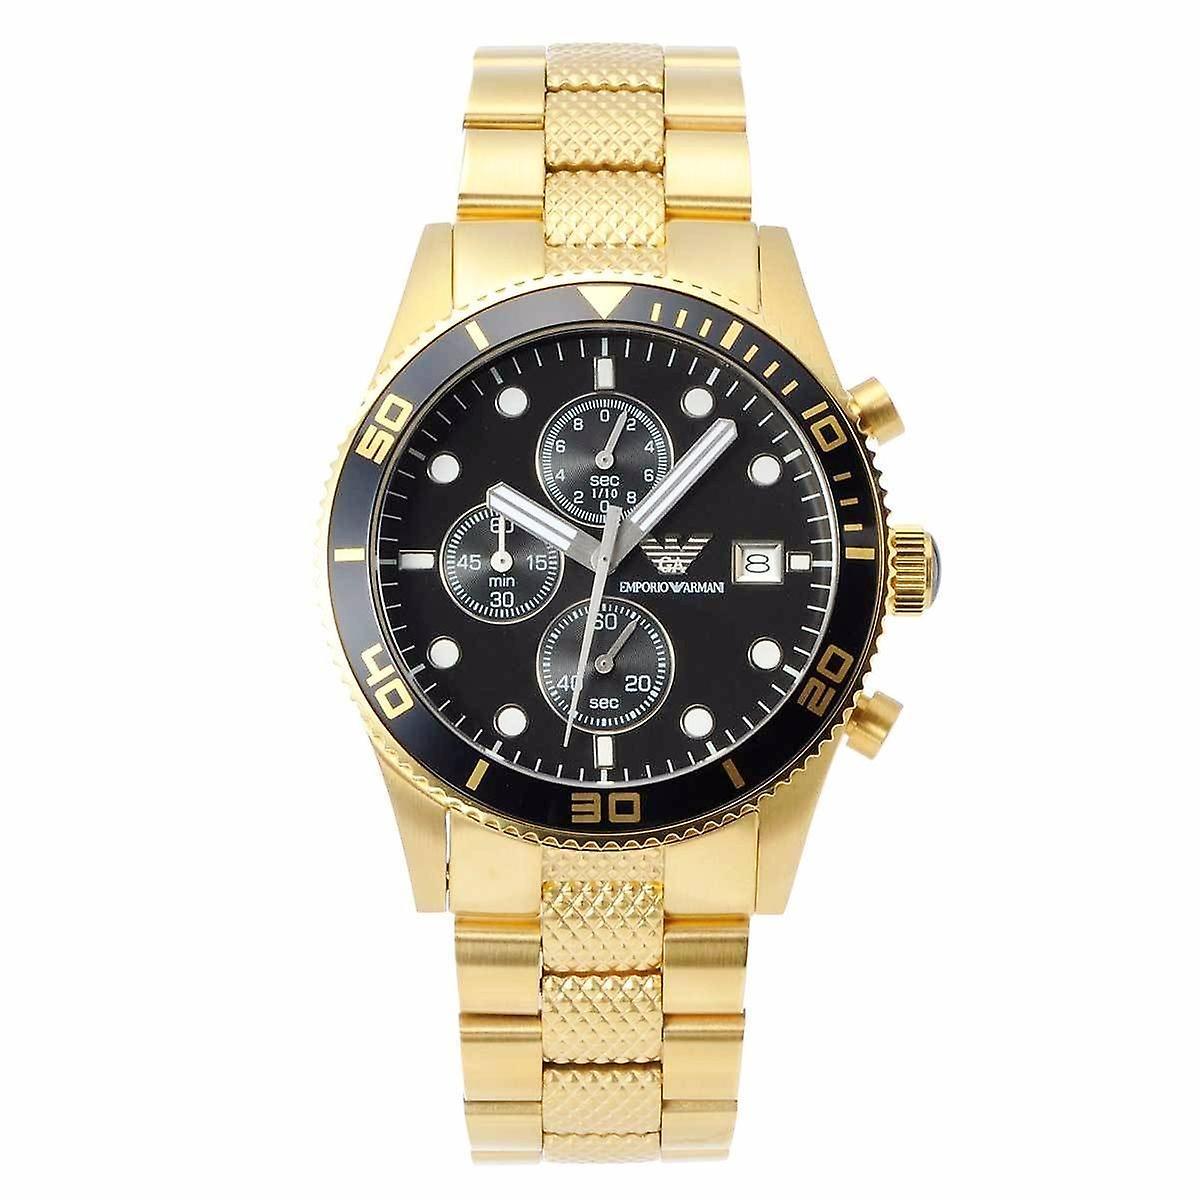 Emporio Armani mannen Chronograph horloge AR5857